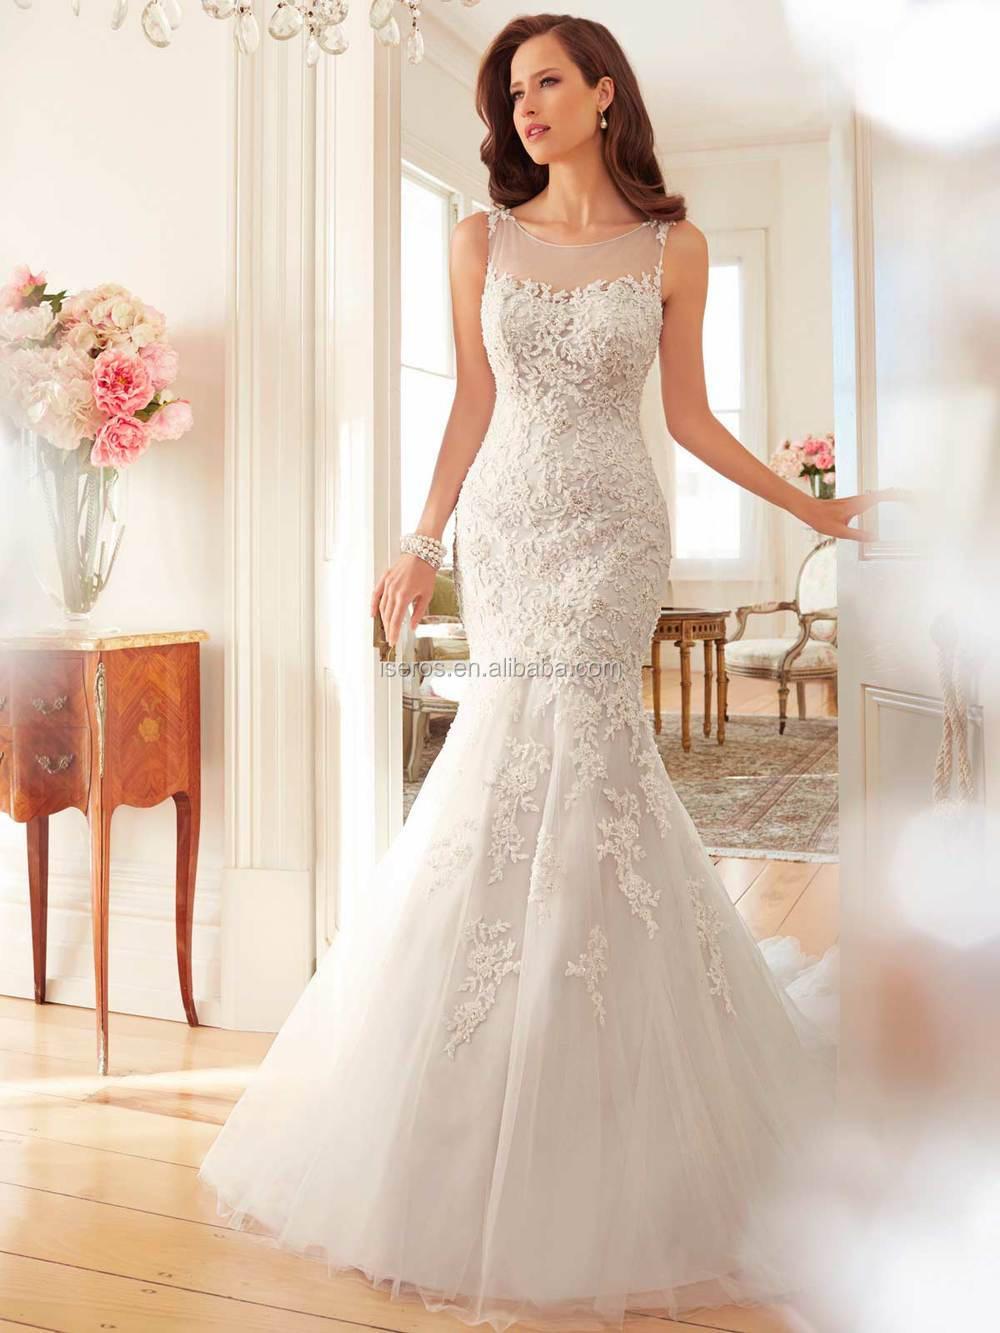 Bling Wedding Dresses 2015 Bling Lace Wedding Dresses